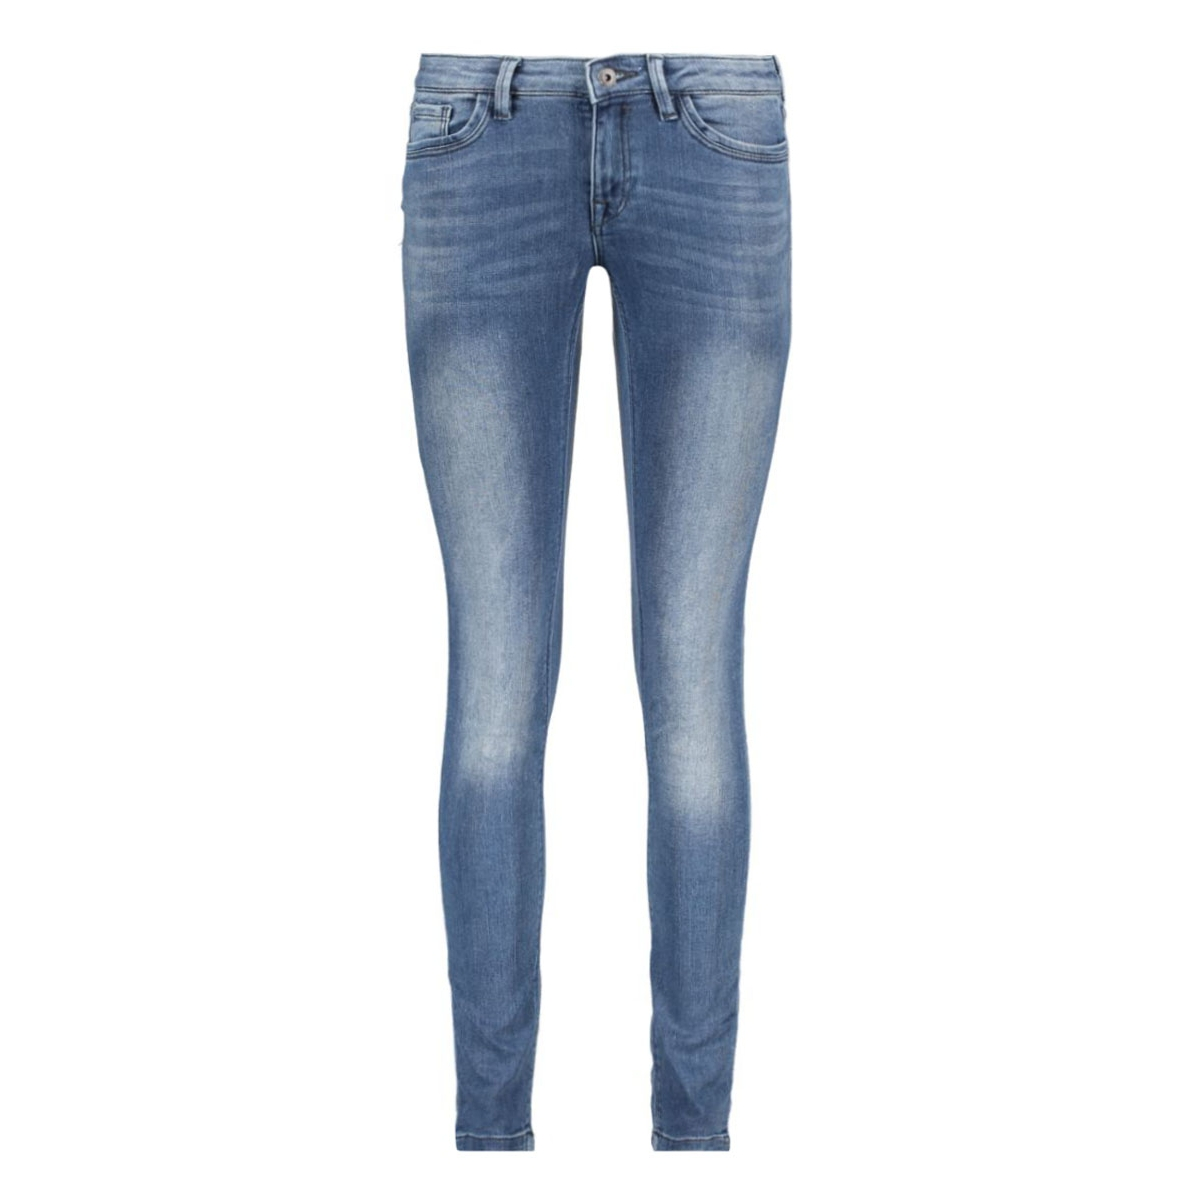 106cc1b013 edc jeans c902